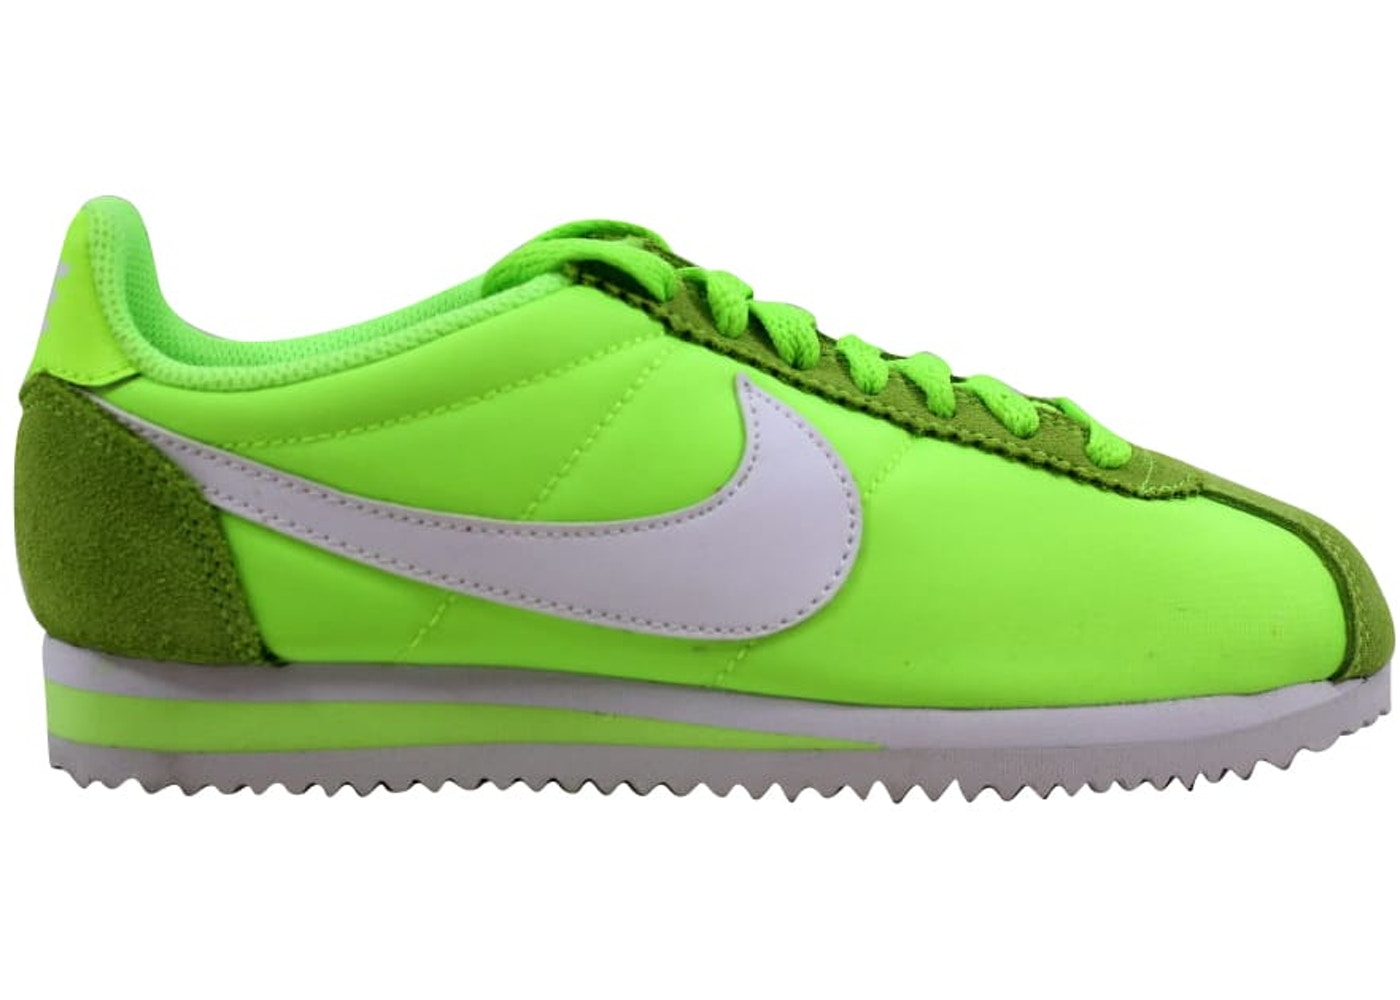 sale retailer 2f059 adef3 Nike Classic Cortez Nylon Ghost Green White (W) - 749864-310